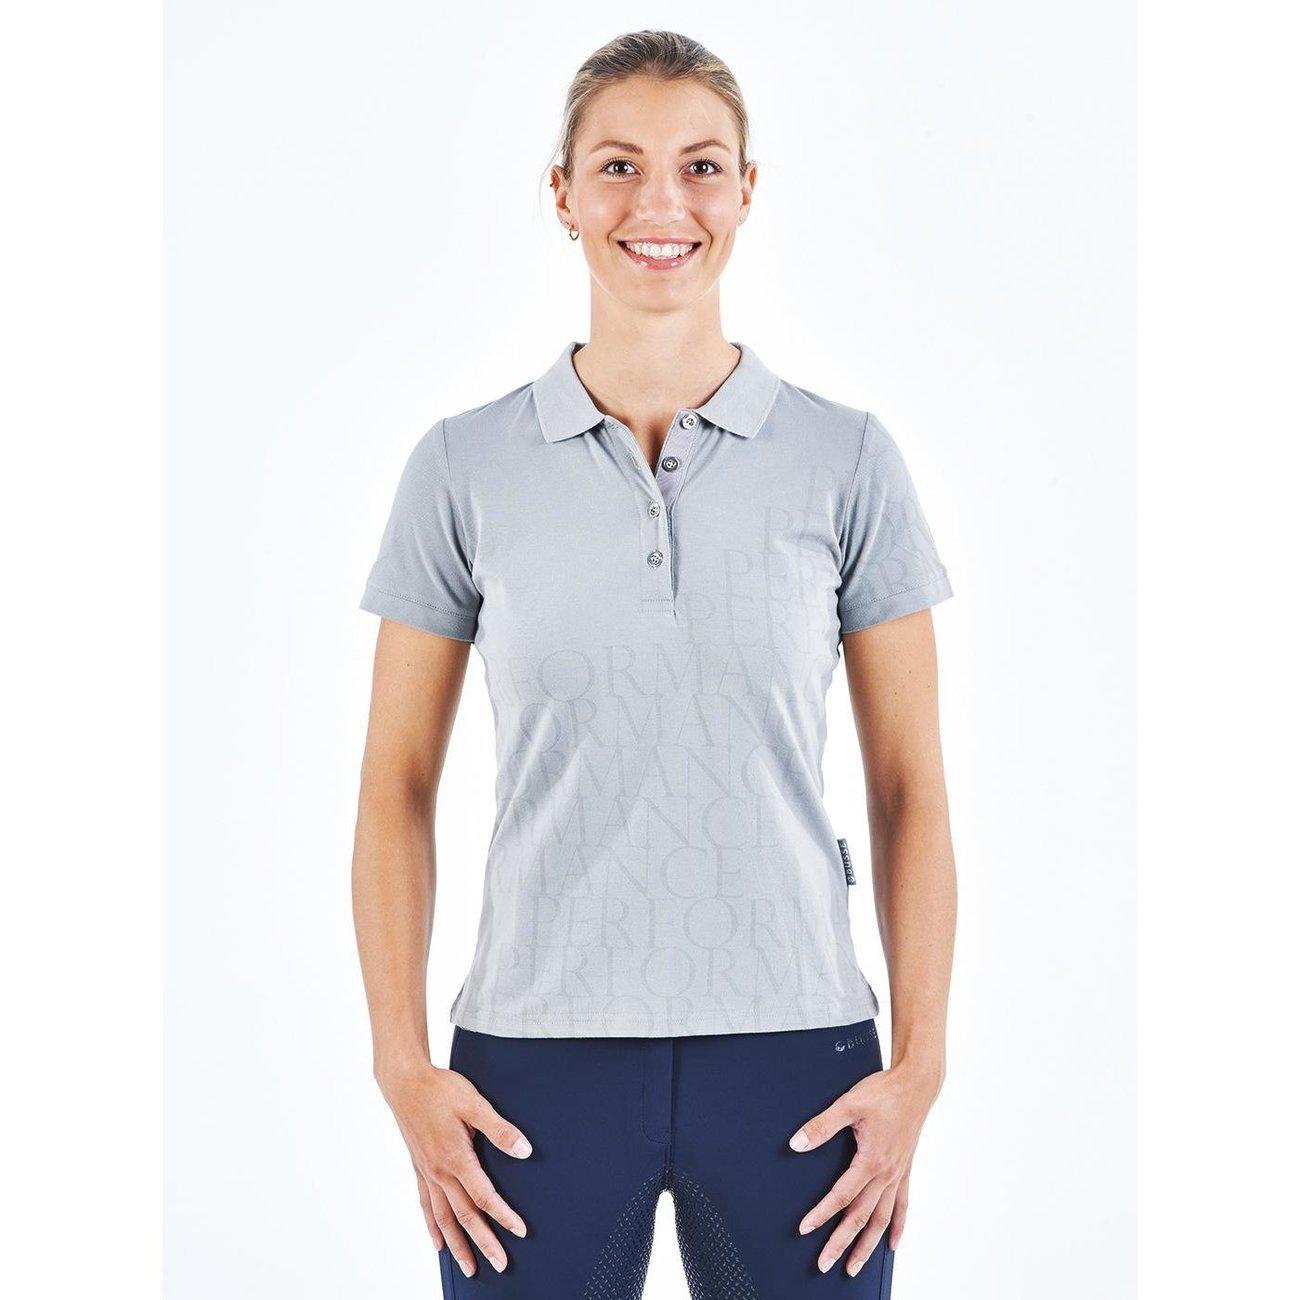 BUSSE Polo Shirt Elia Preview Image